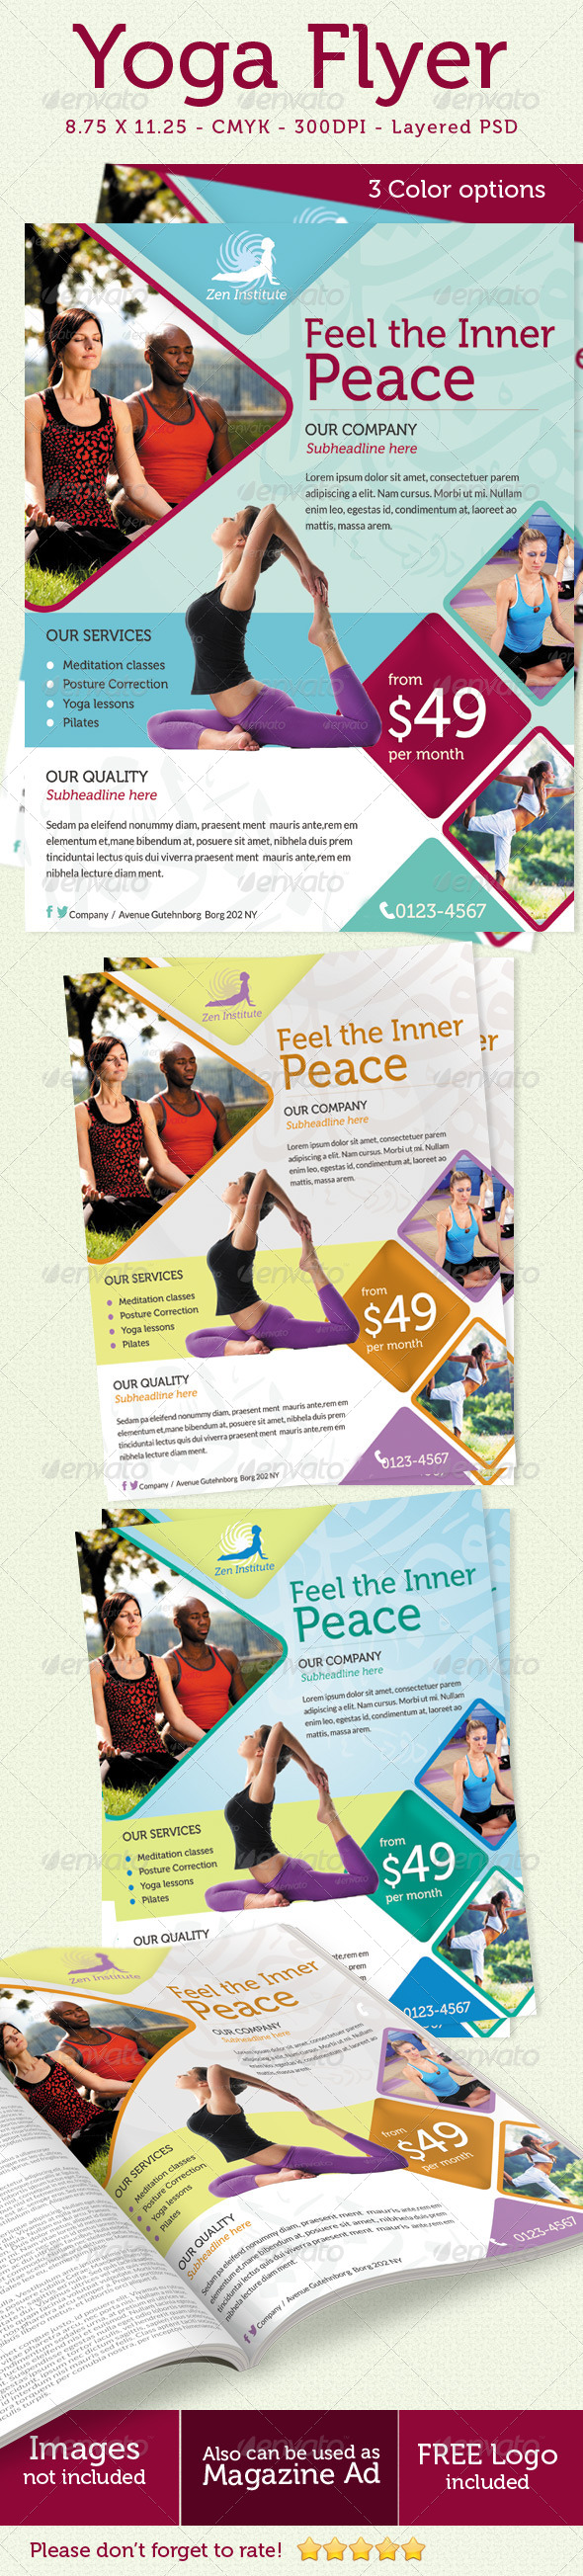 GraphicRiver Yoga Flyer Print ad 5215785